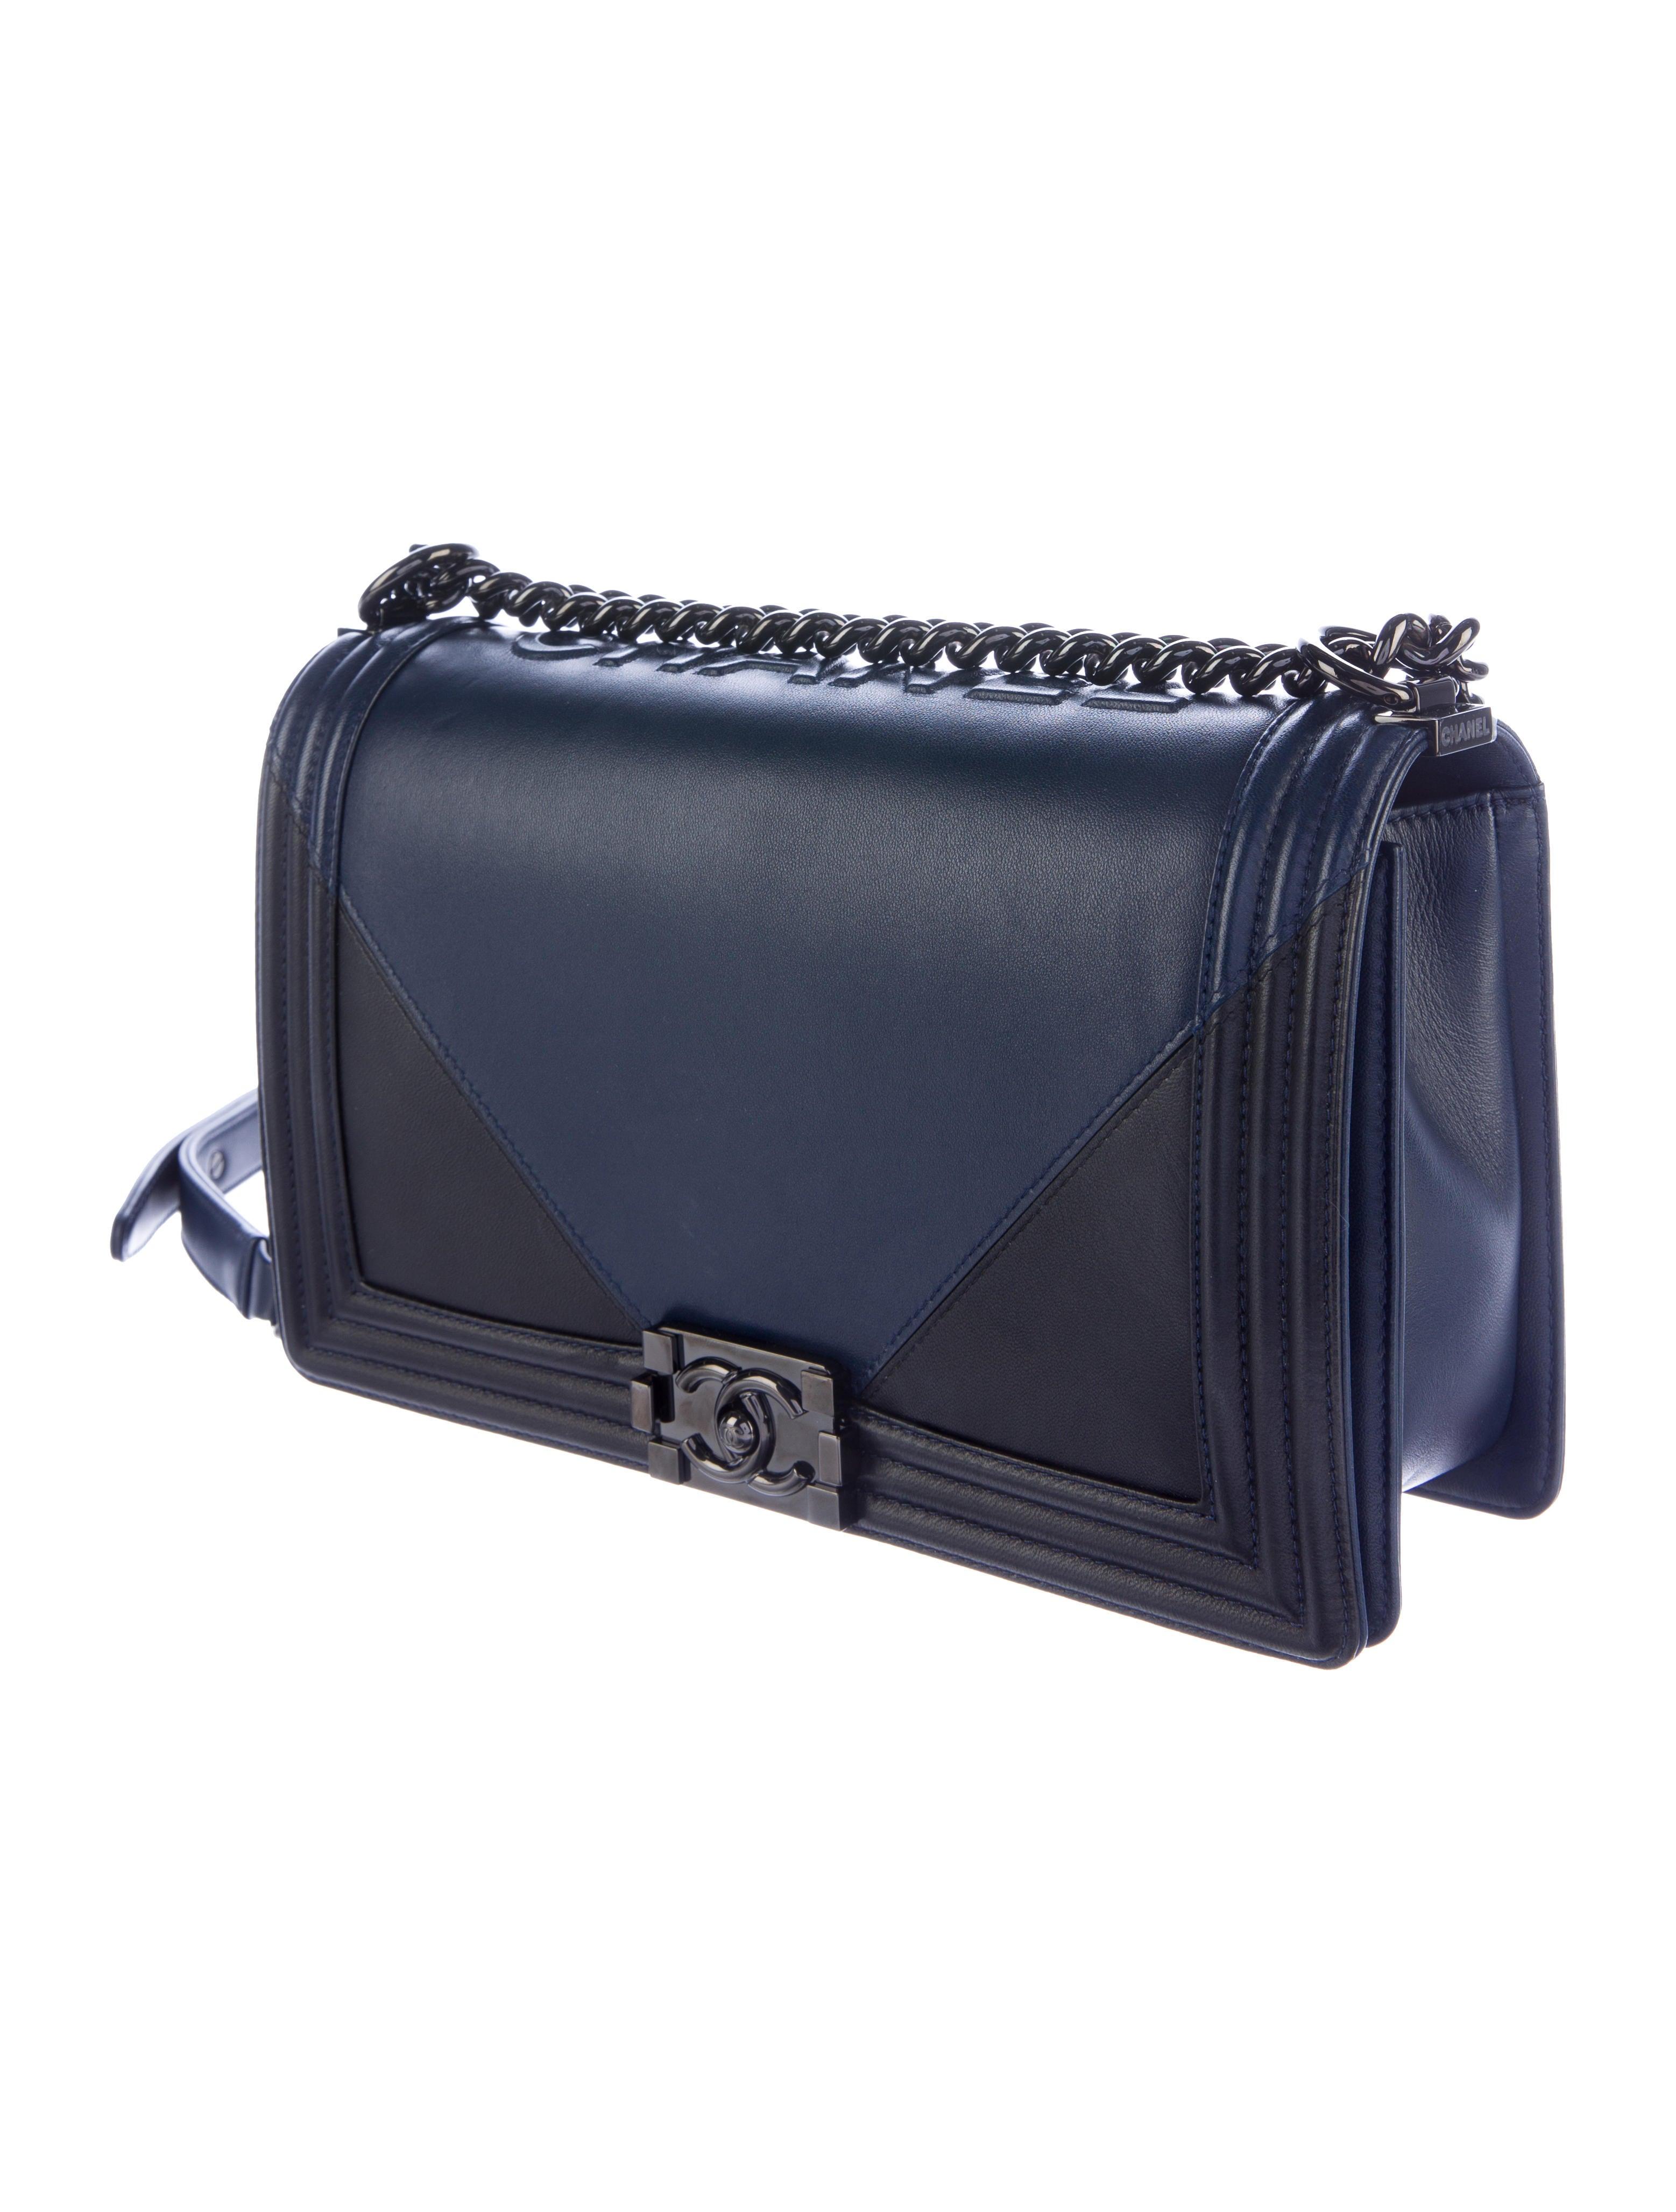 Chanel 2017 Medium Plus Boy Bag - Handbags - CHA168605 : The RealReal